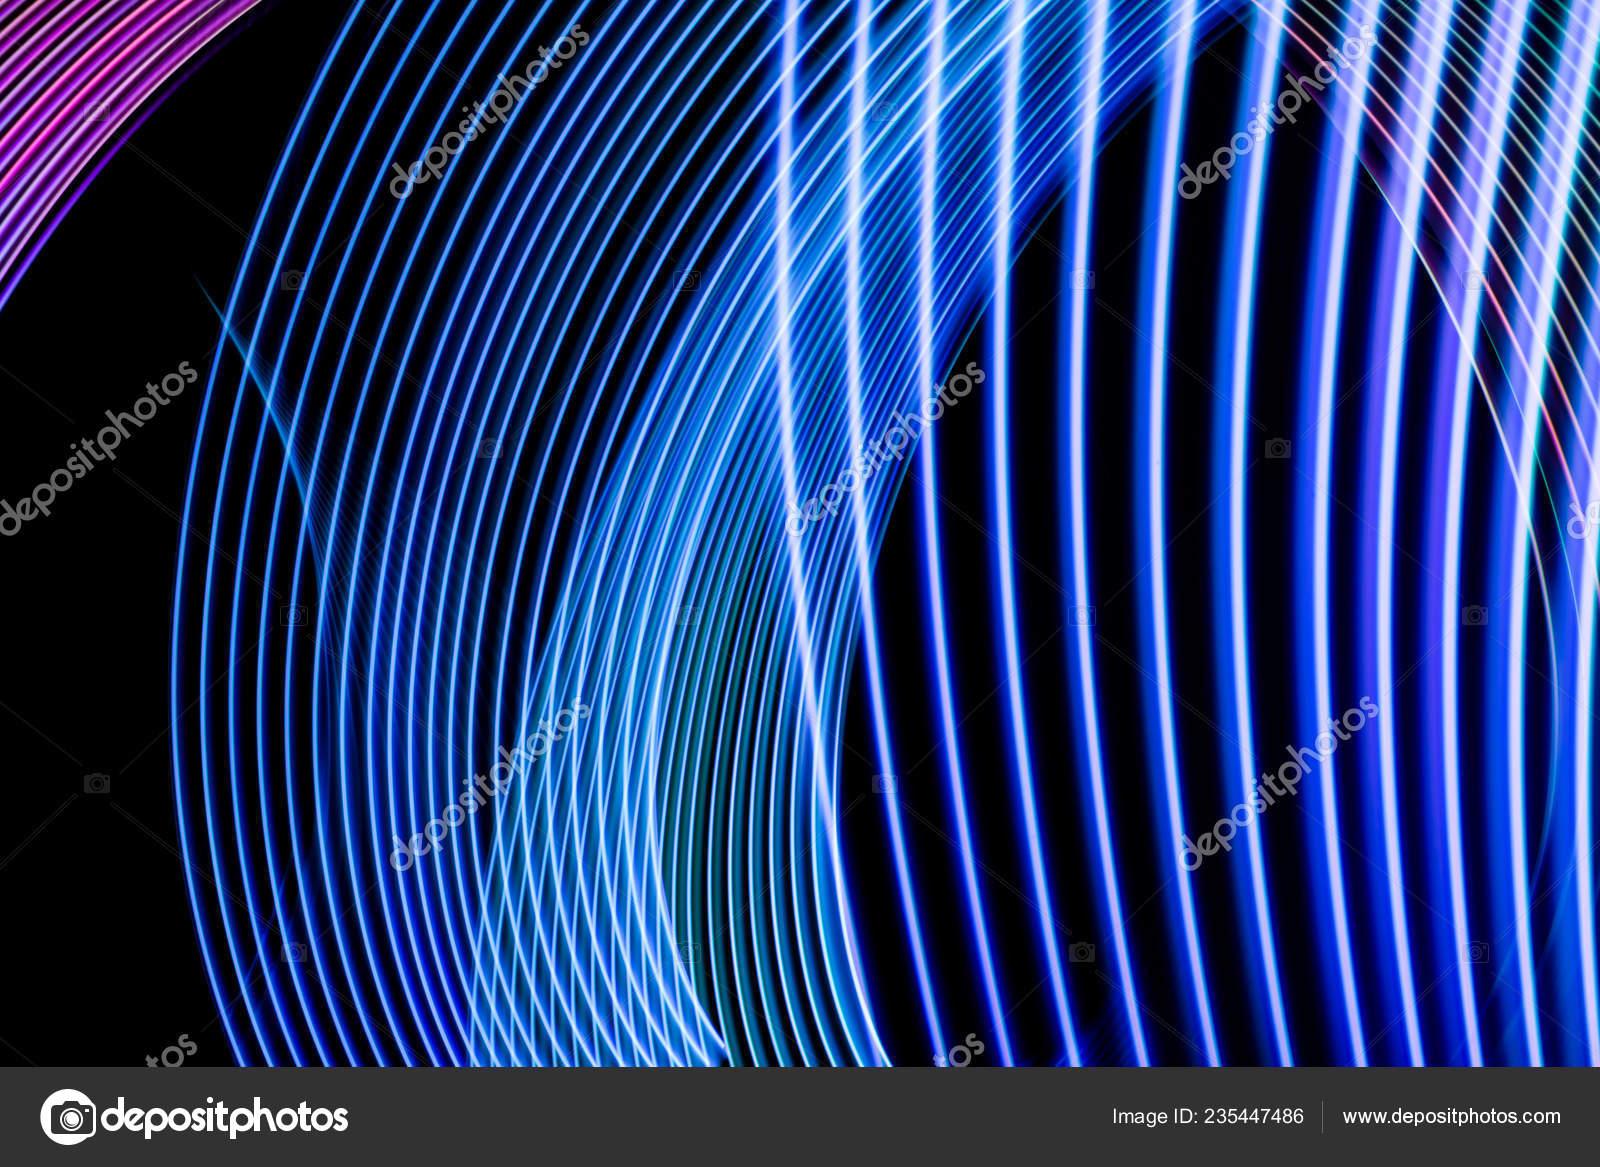 Unduh 5400 Background Aesthetics HD Paling Keren